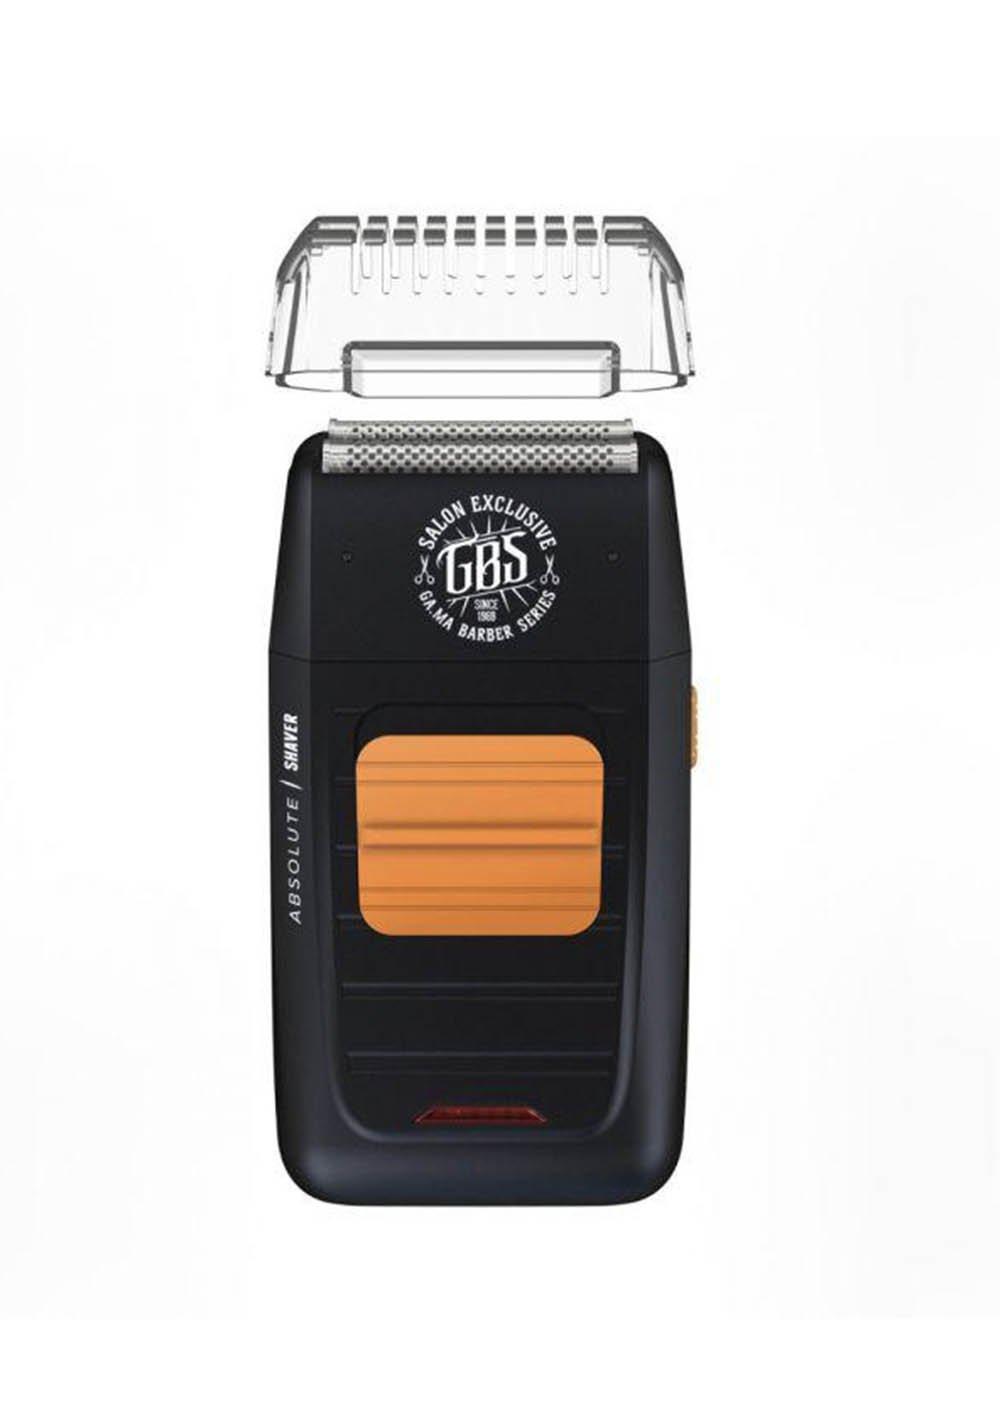 GBS Absolute Shaver 37256 Ξυριστική Μηχανή Προσώπου Επαναφορτιζόμενη